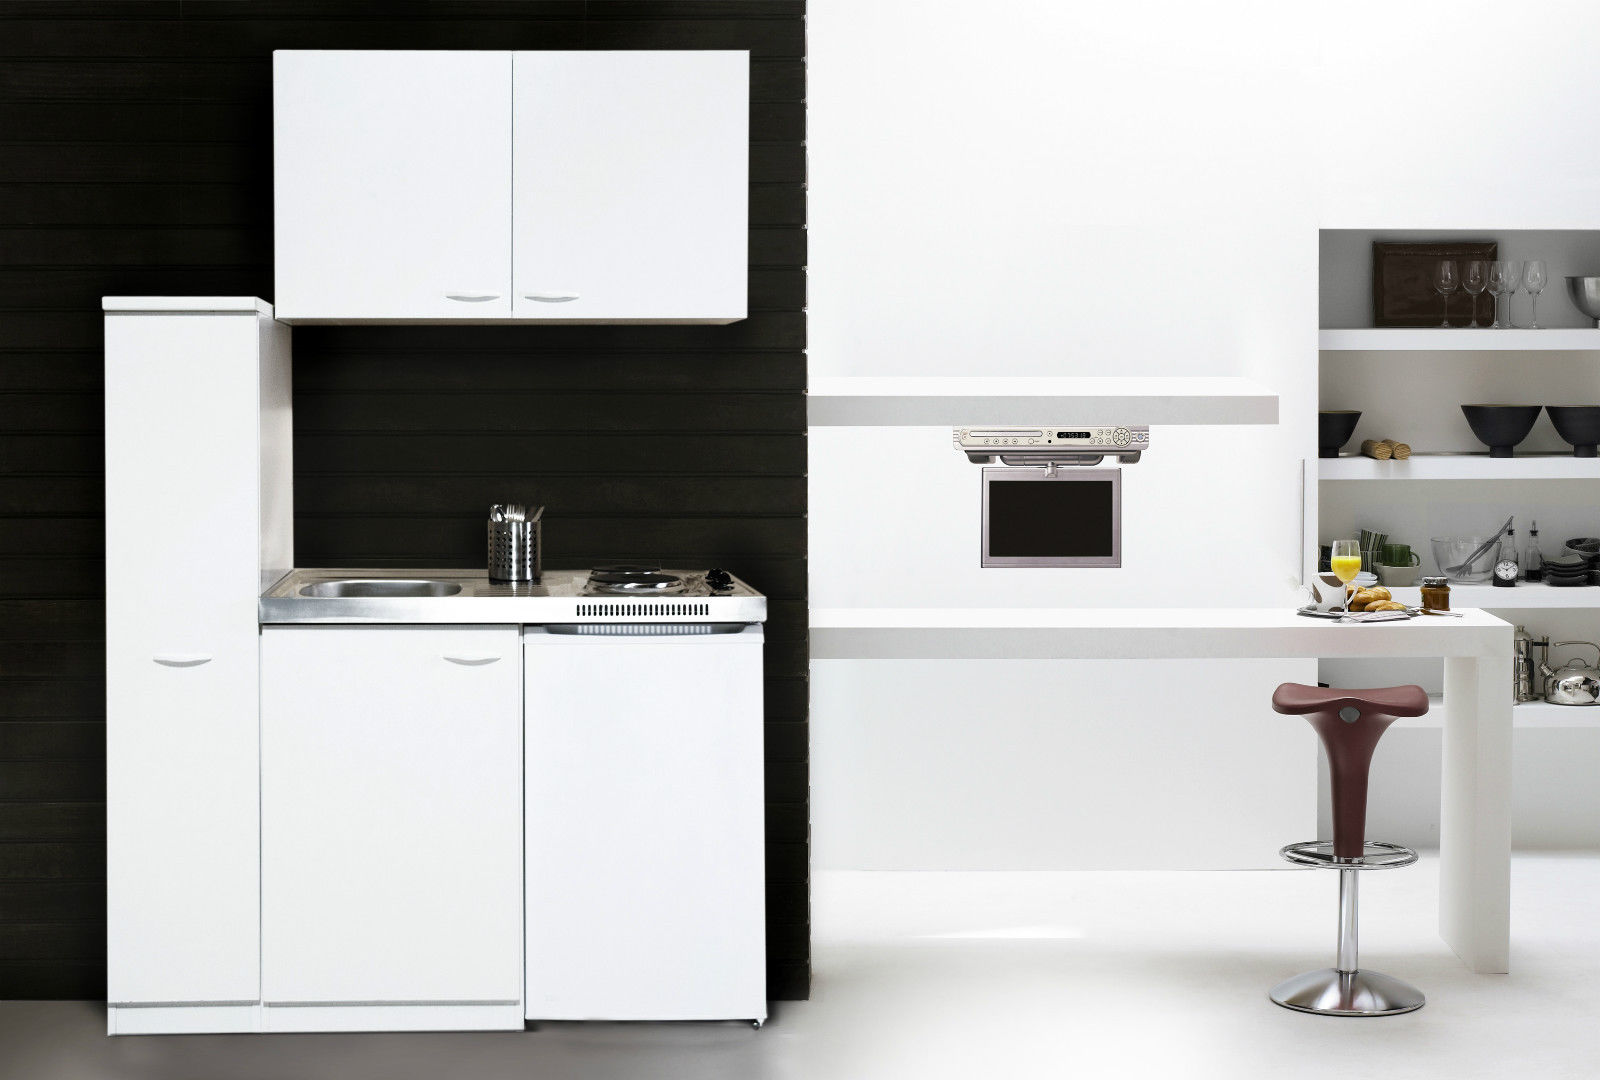 k che minik che k chenzeile k chenblock single pantryk che 130 cm wei respekta ebay. Black Bedroom Furniture Sets. Home Design Ideas